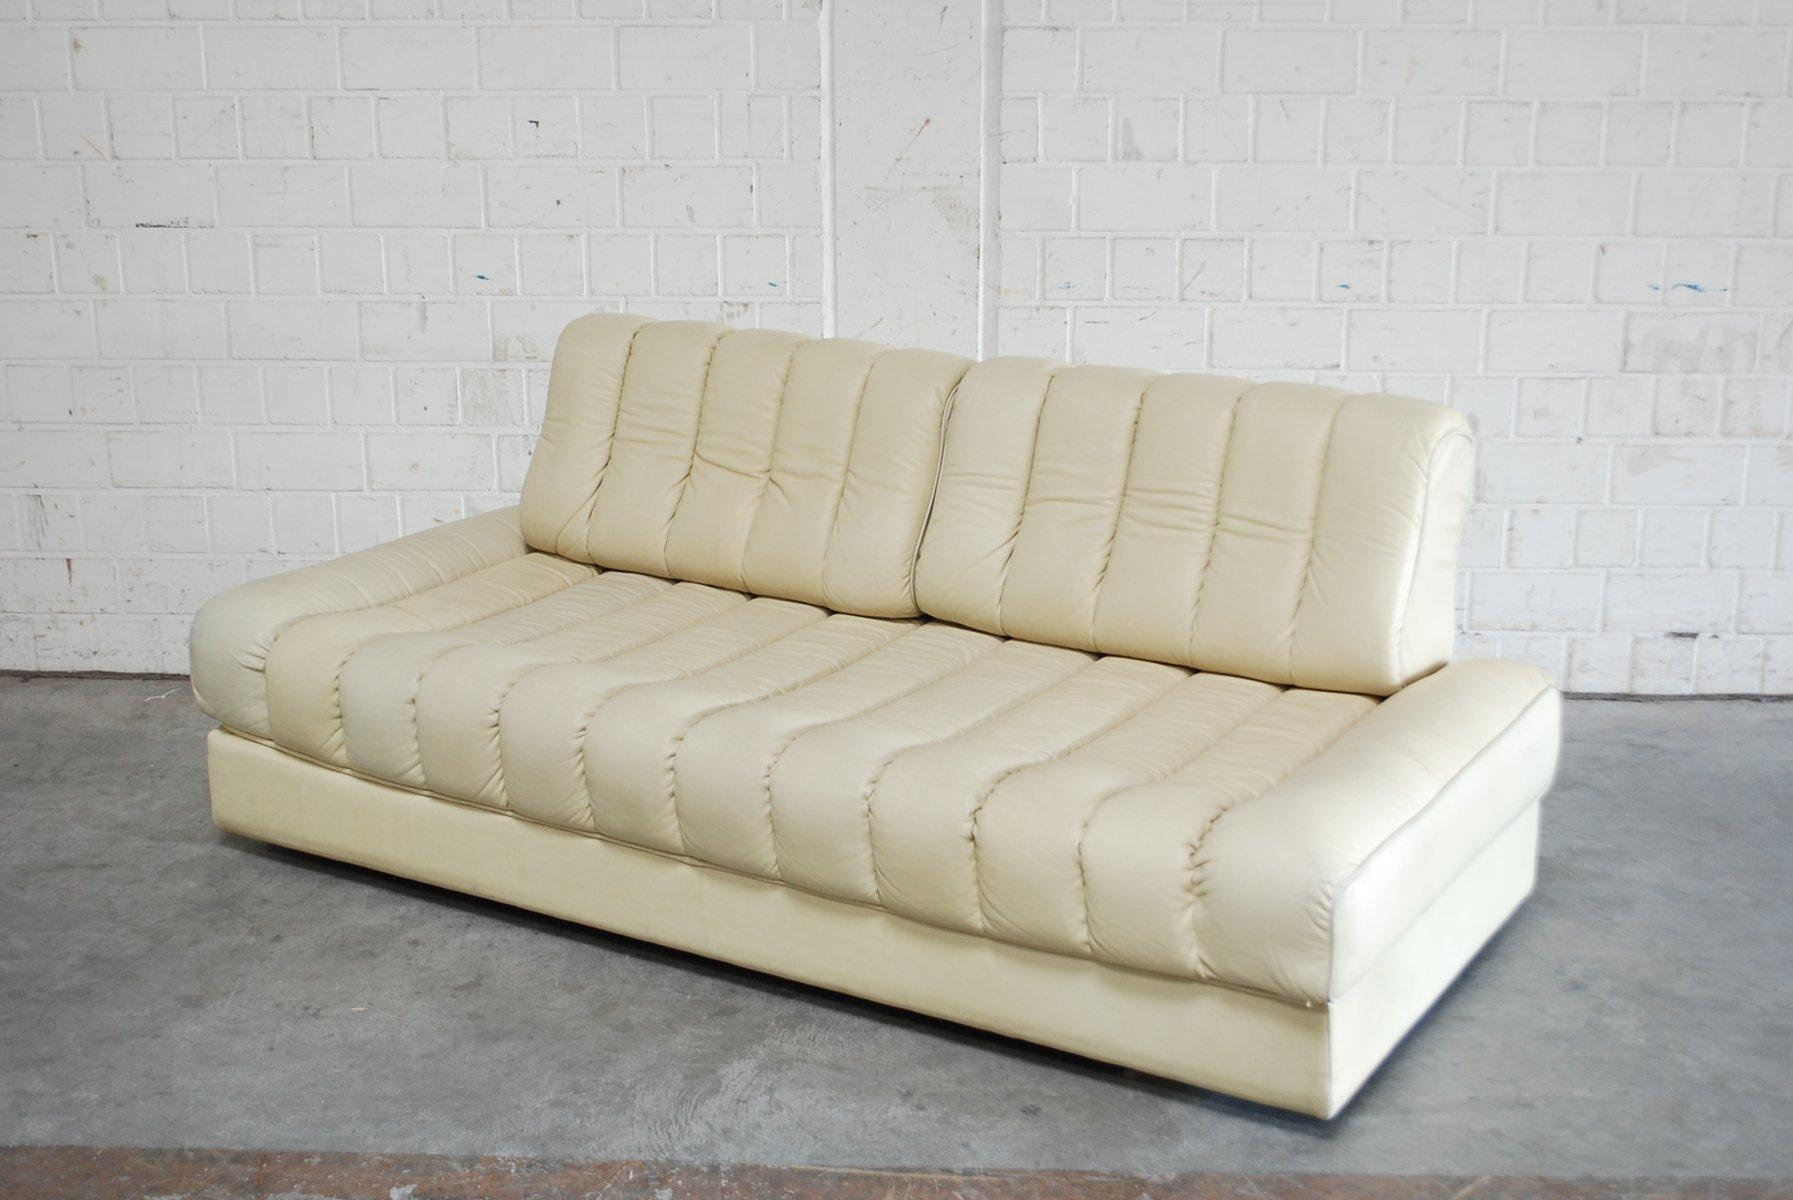 vintage ds 85 leder schlafsofa von de sede bei pamono kaufen. Black Bedroom Furniture Sets. Home Design Ideas